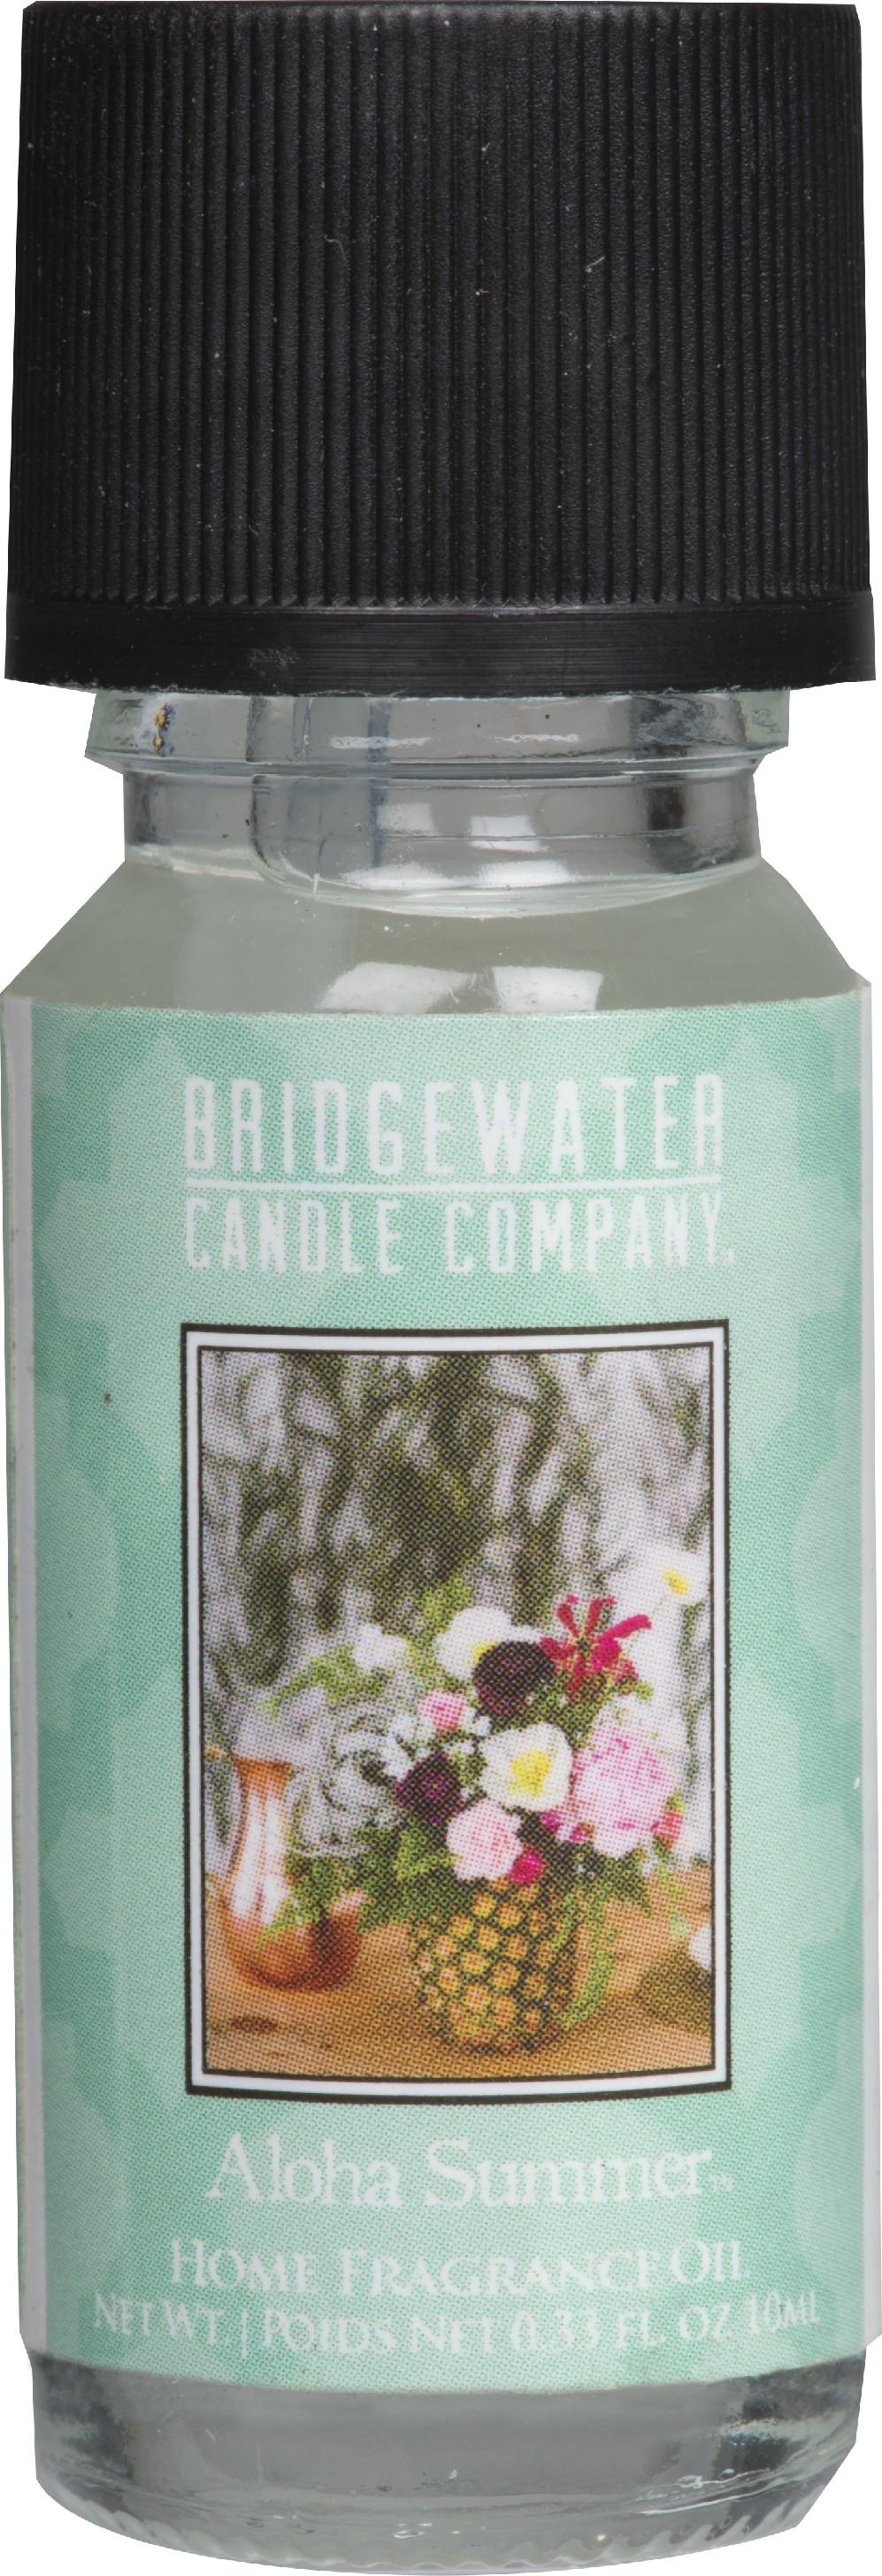 Bridgewater Candle Company Vonný olej Aloha Summer